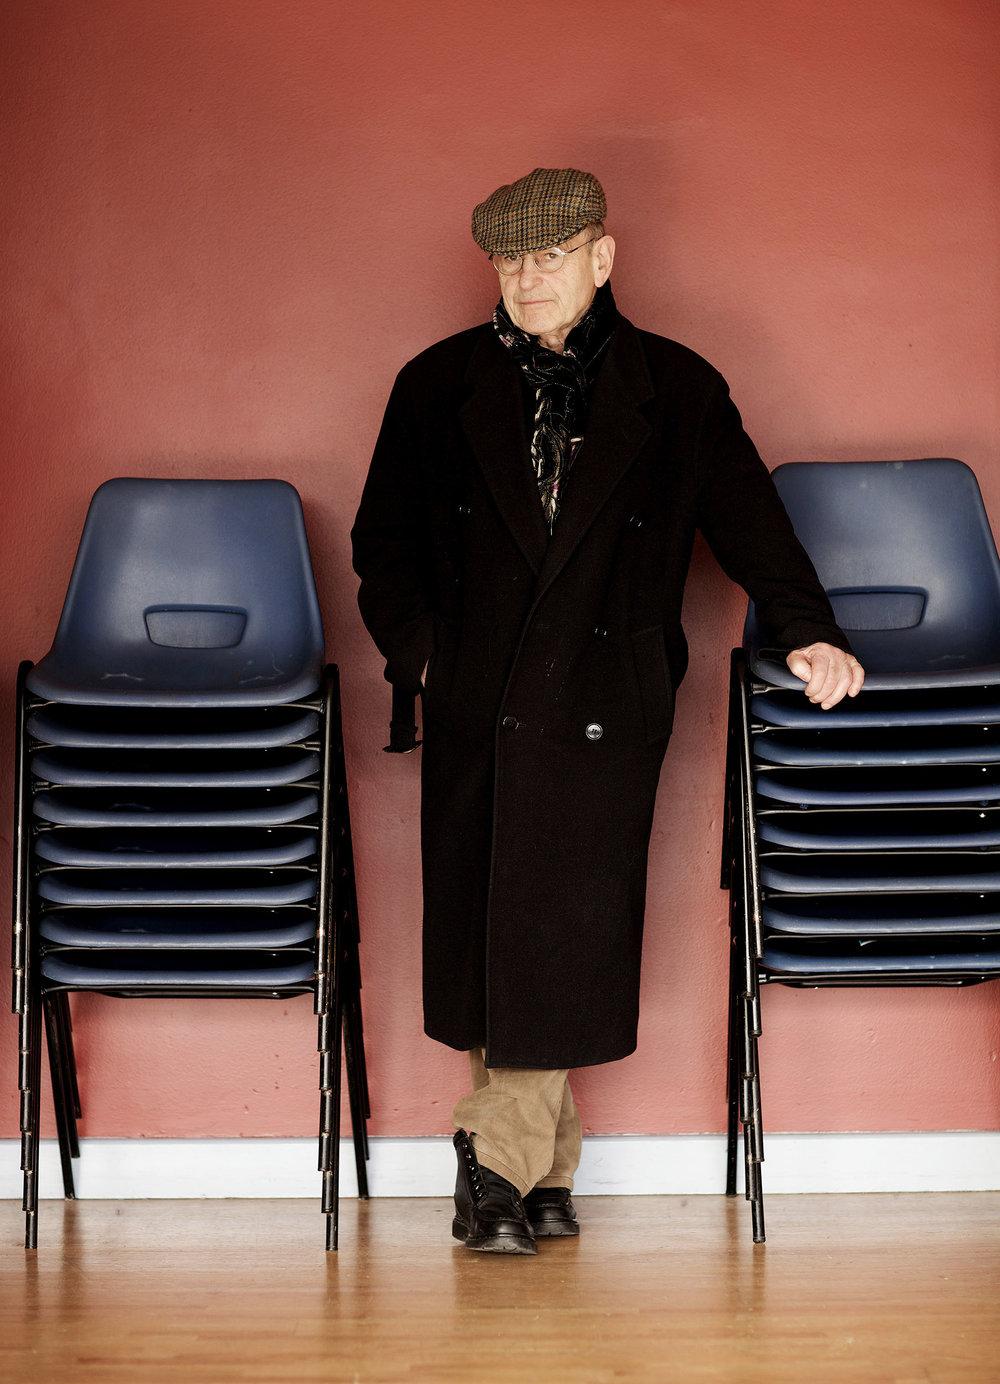 Portraits-TomMurphy-Bolger-Photography.jpg